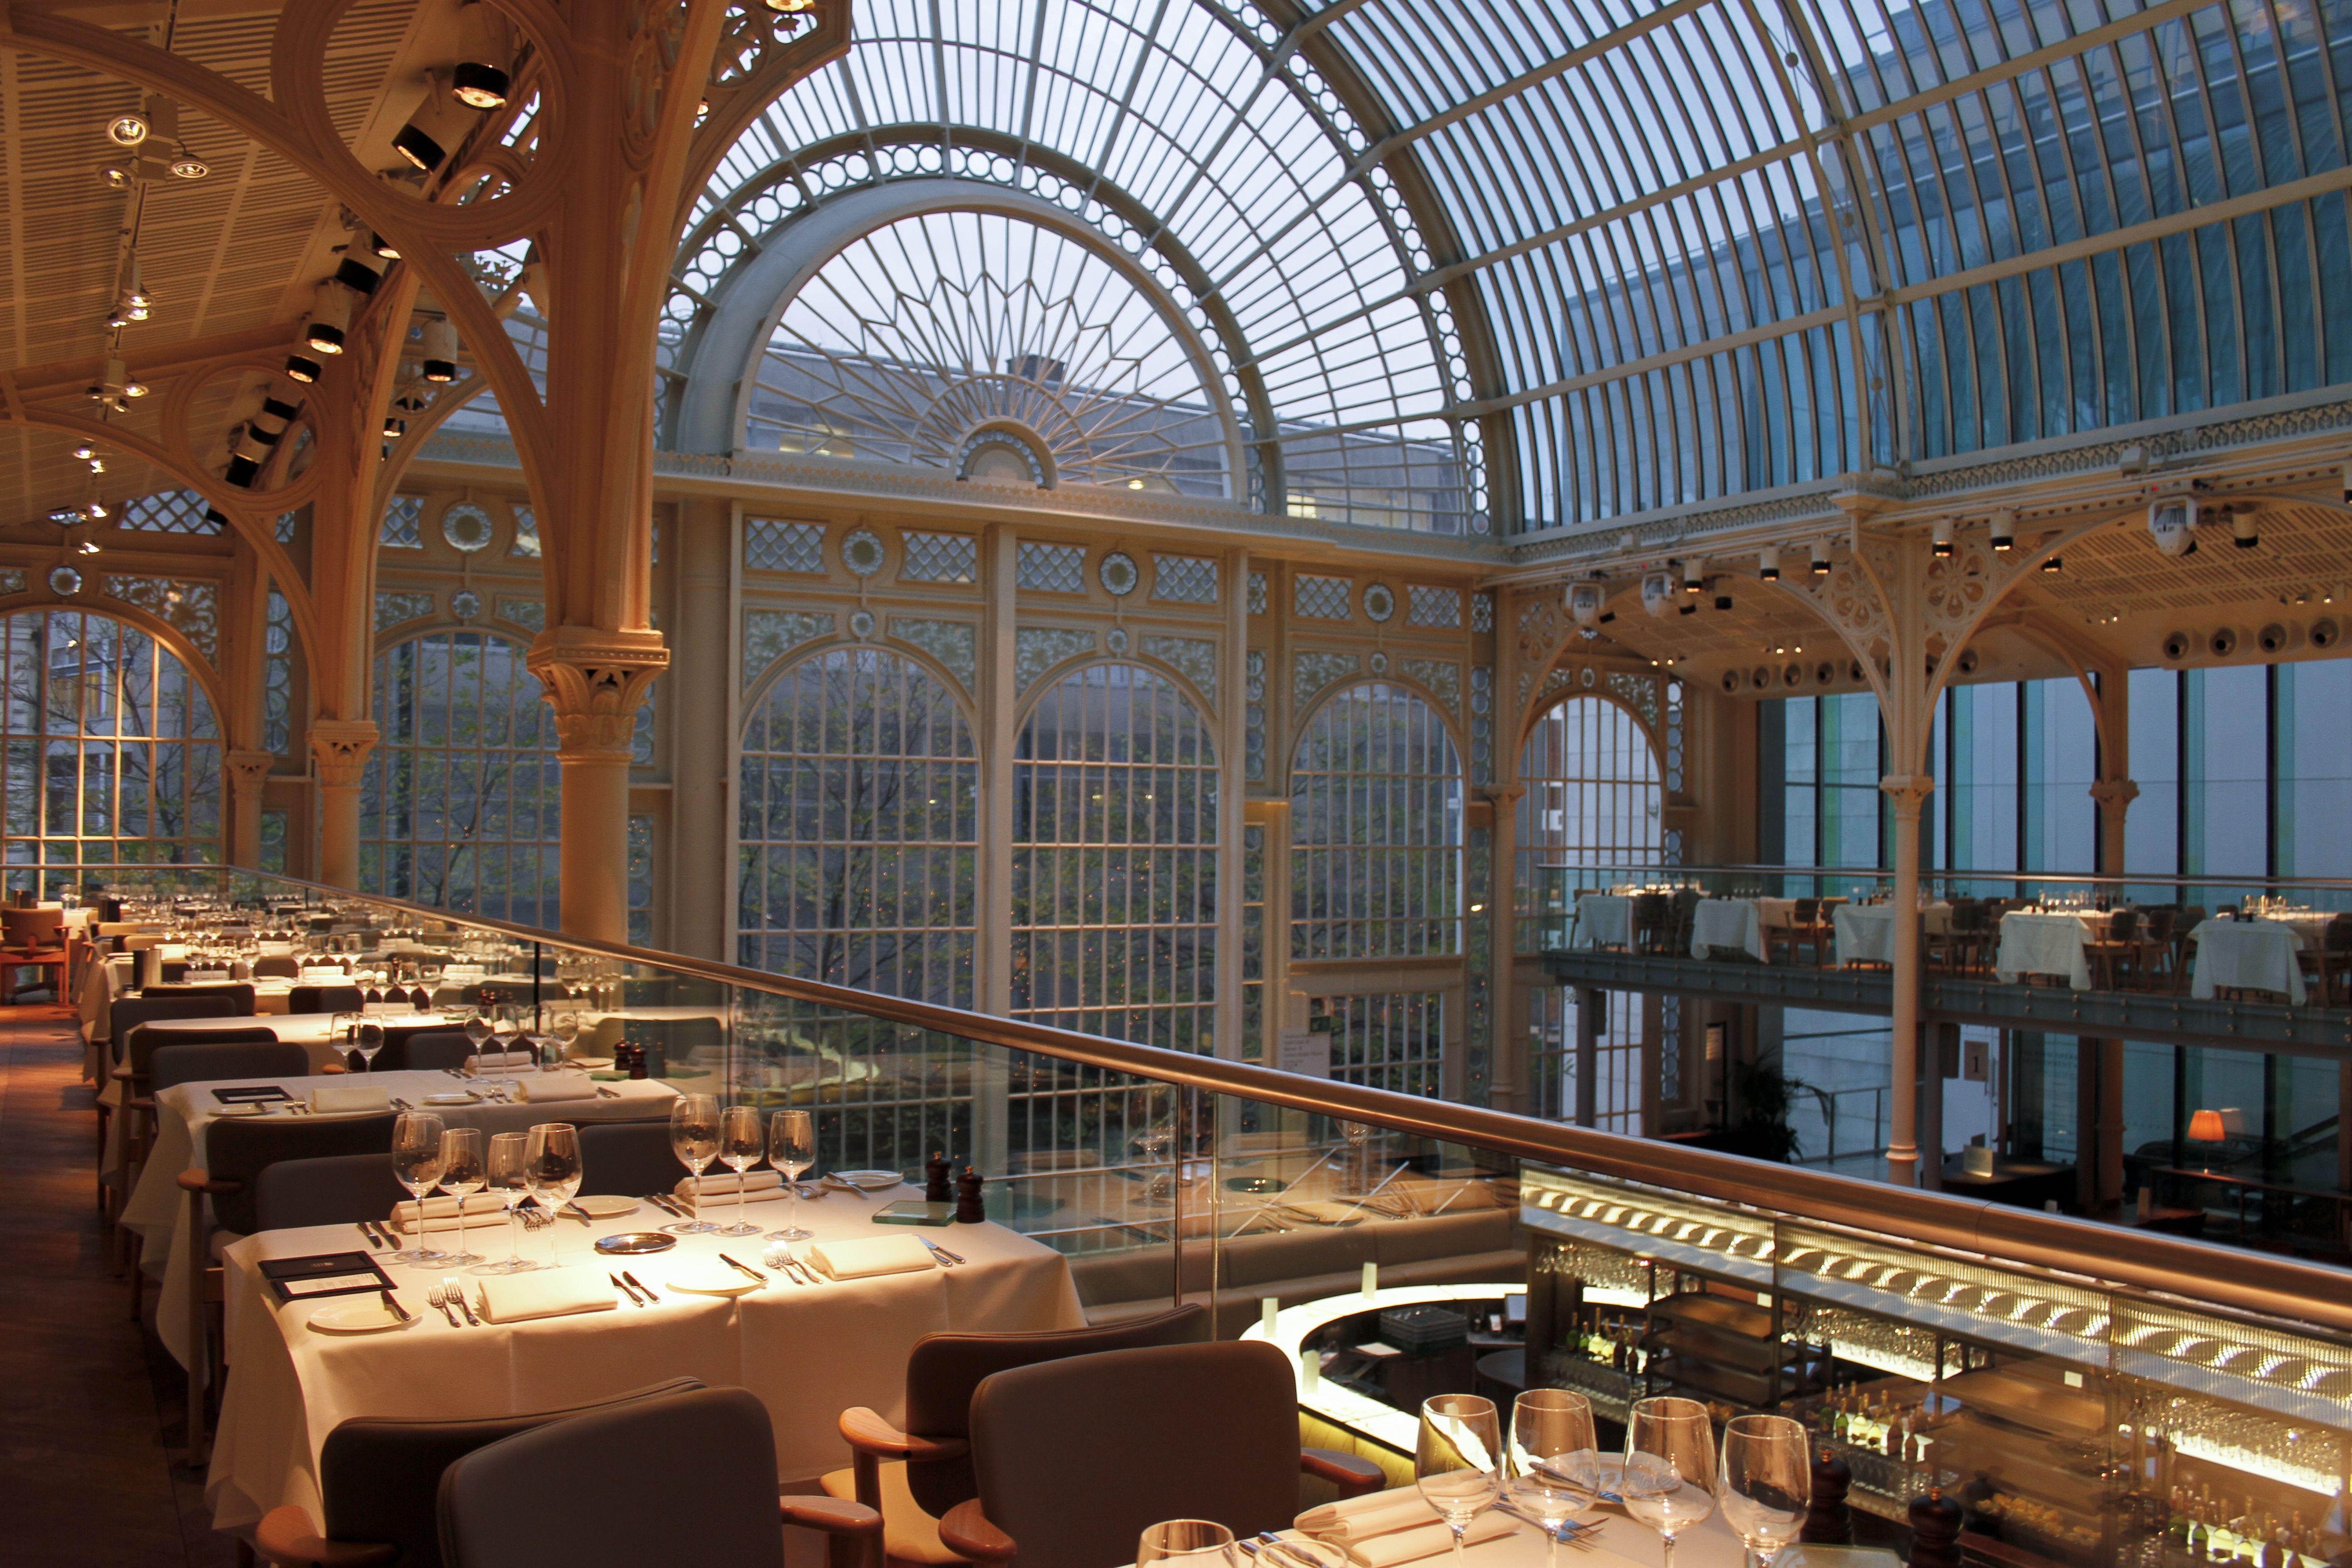 Paul Hamlyn Hall Balconies Restaurant | Royal opera house ...